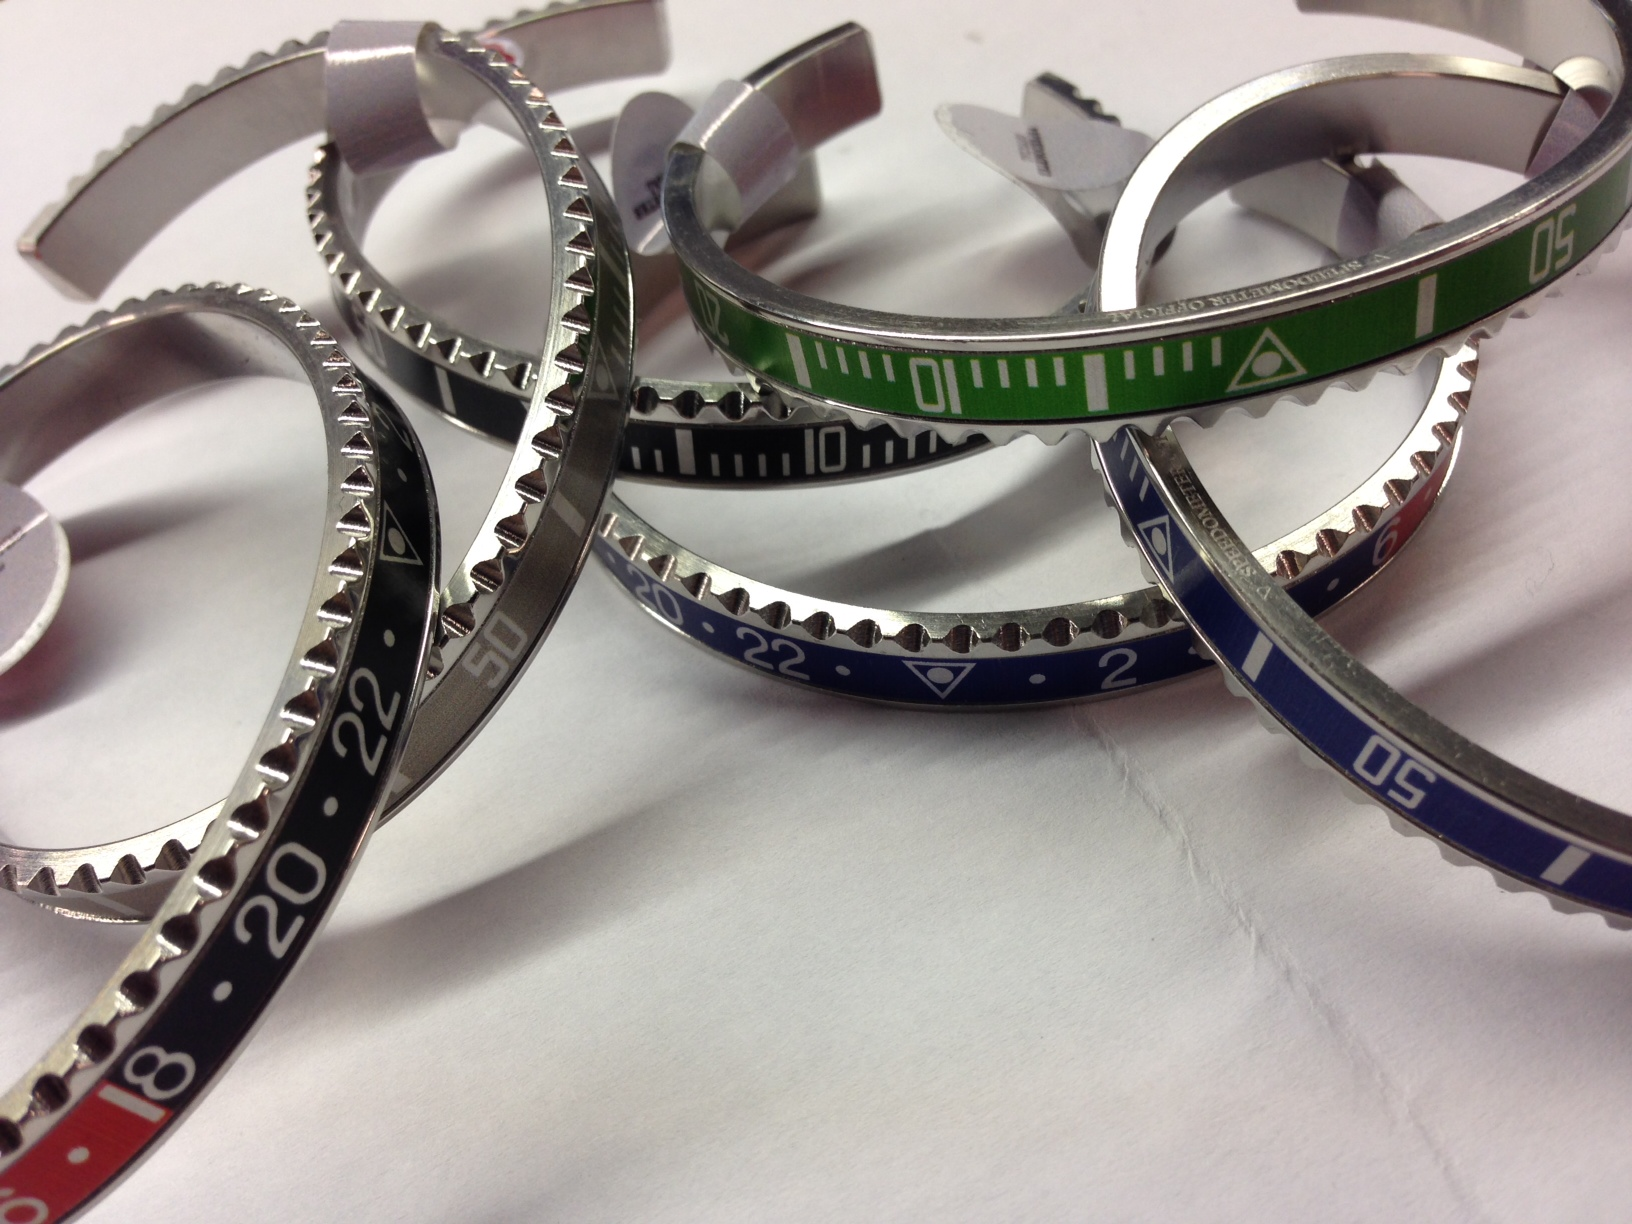 bracelet speedometer official chez cresus lunette montre